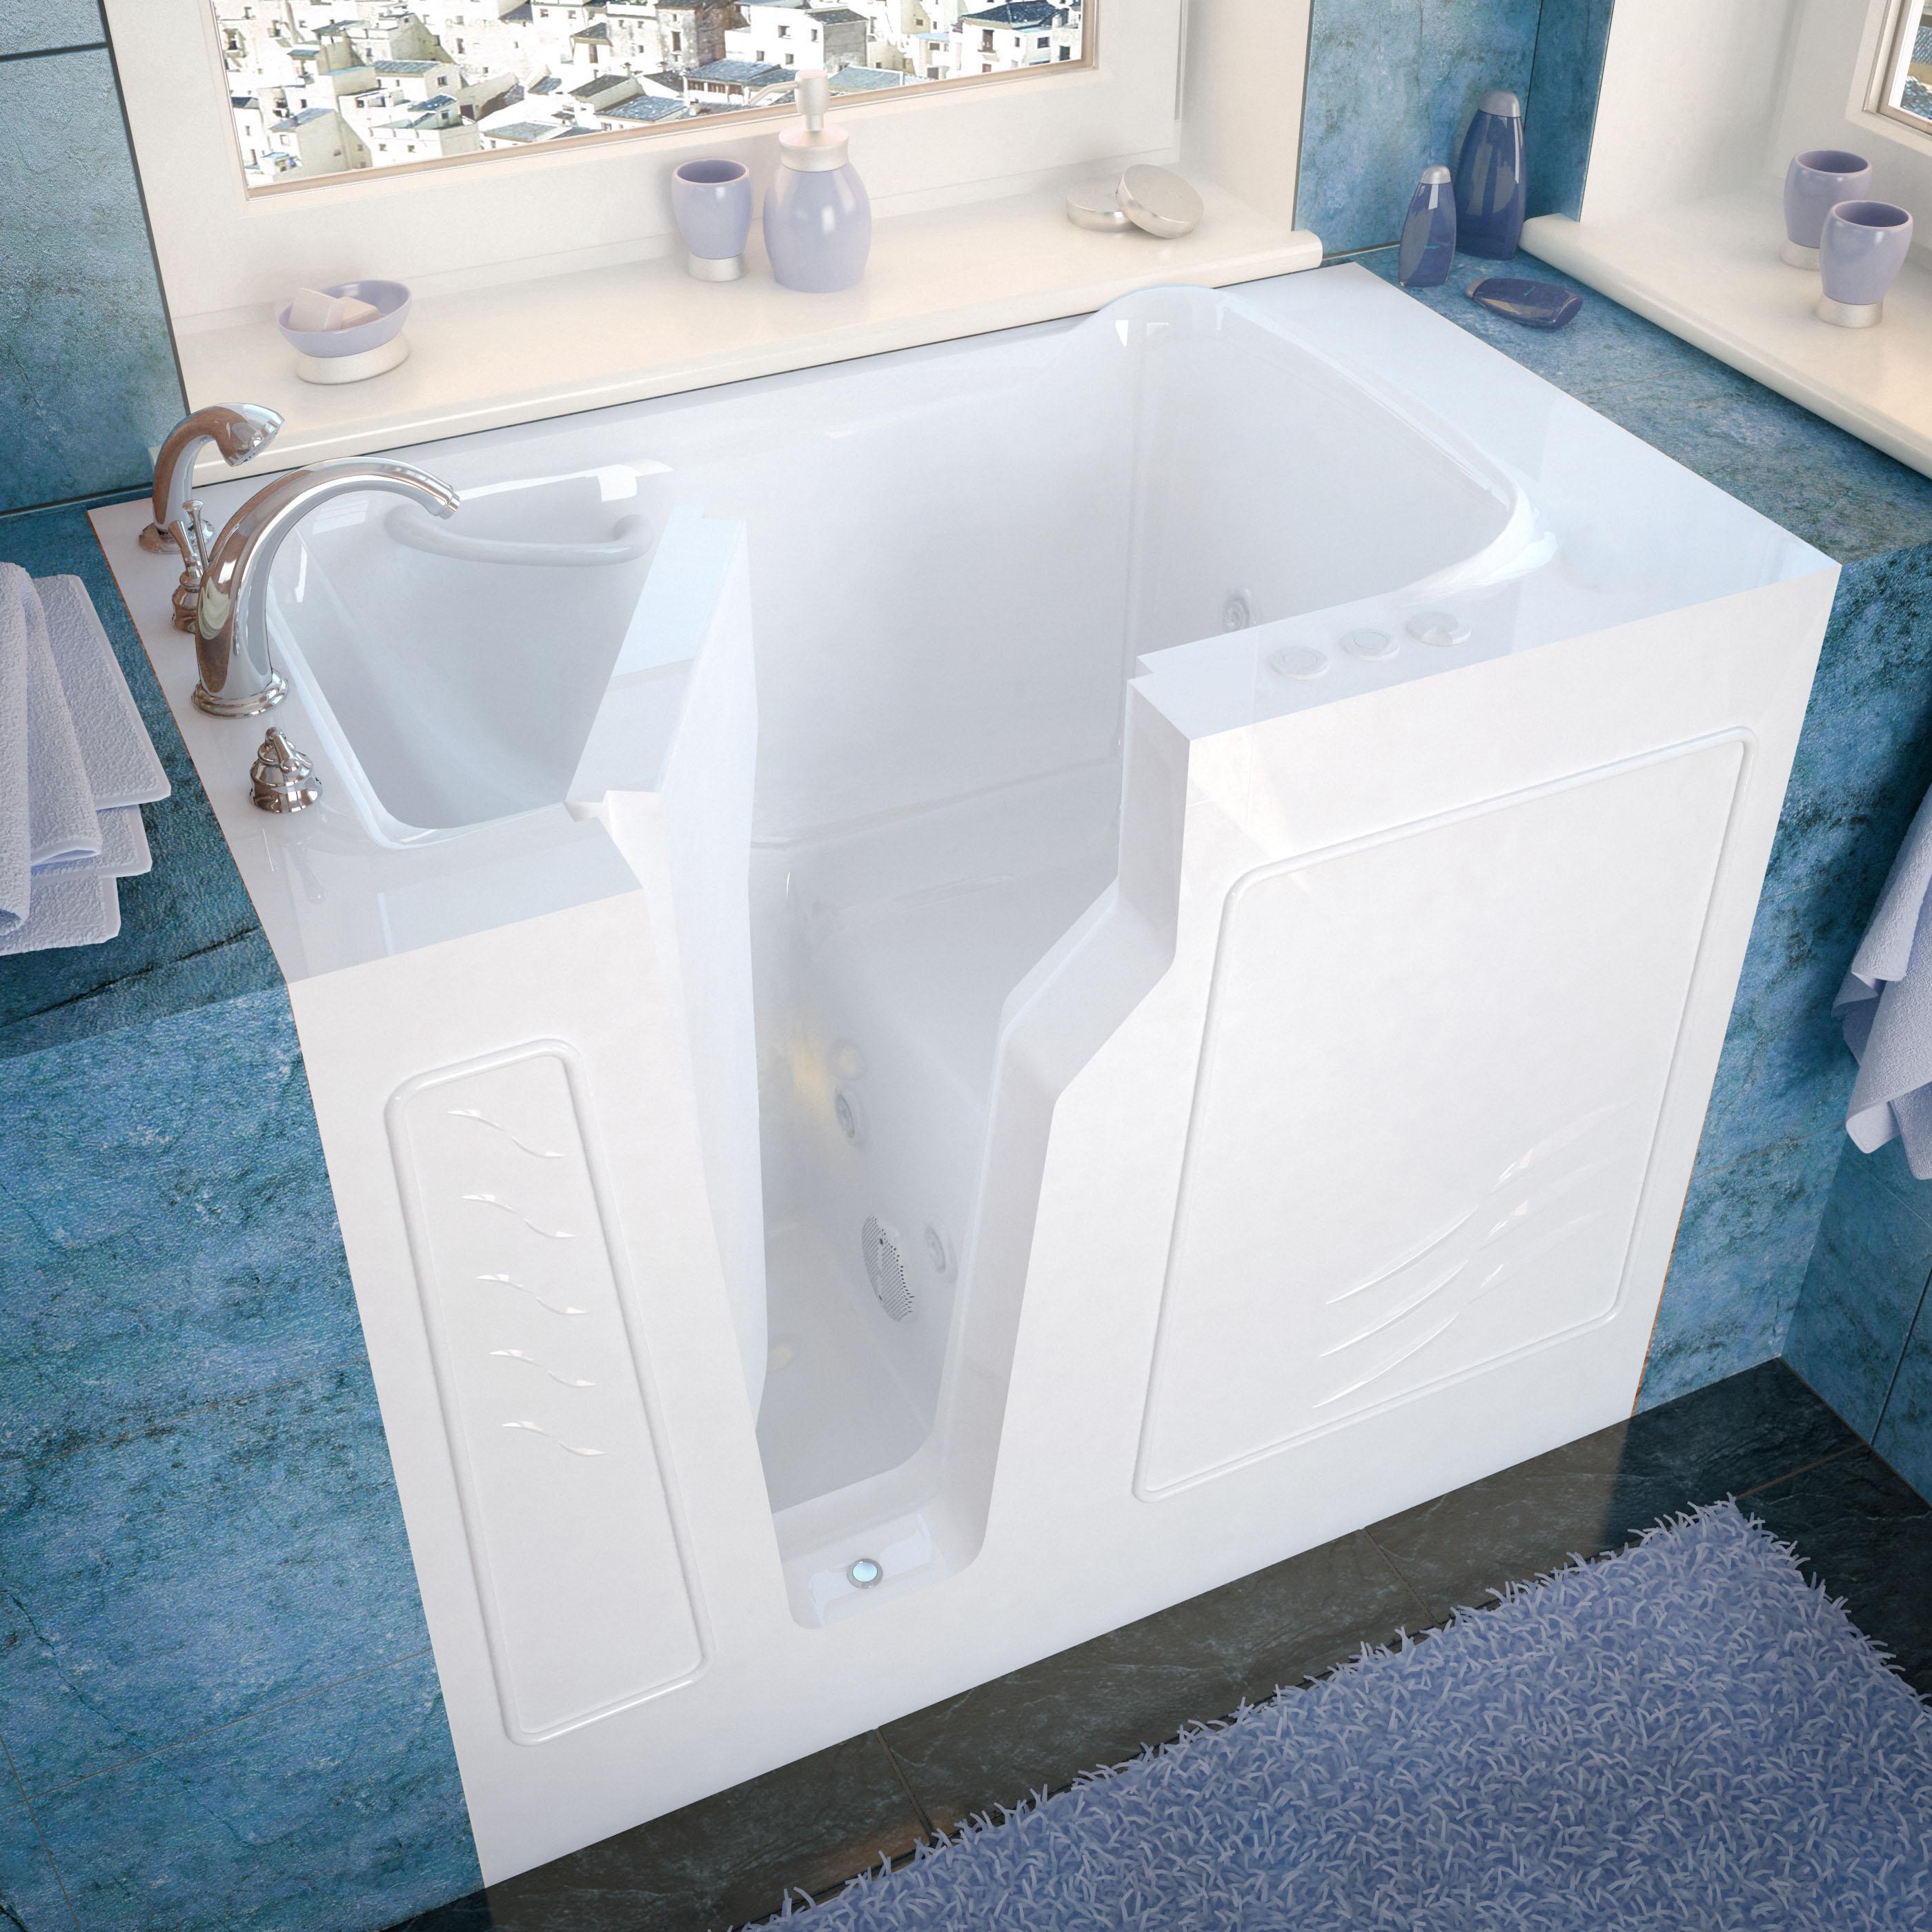 26x46 Left Drain White Whirlpool Jetted Walk-In Bathtub